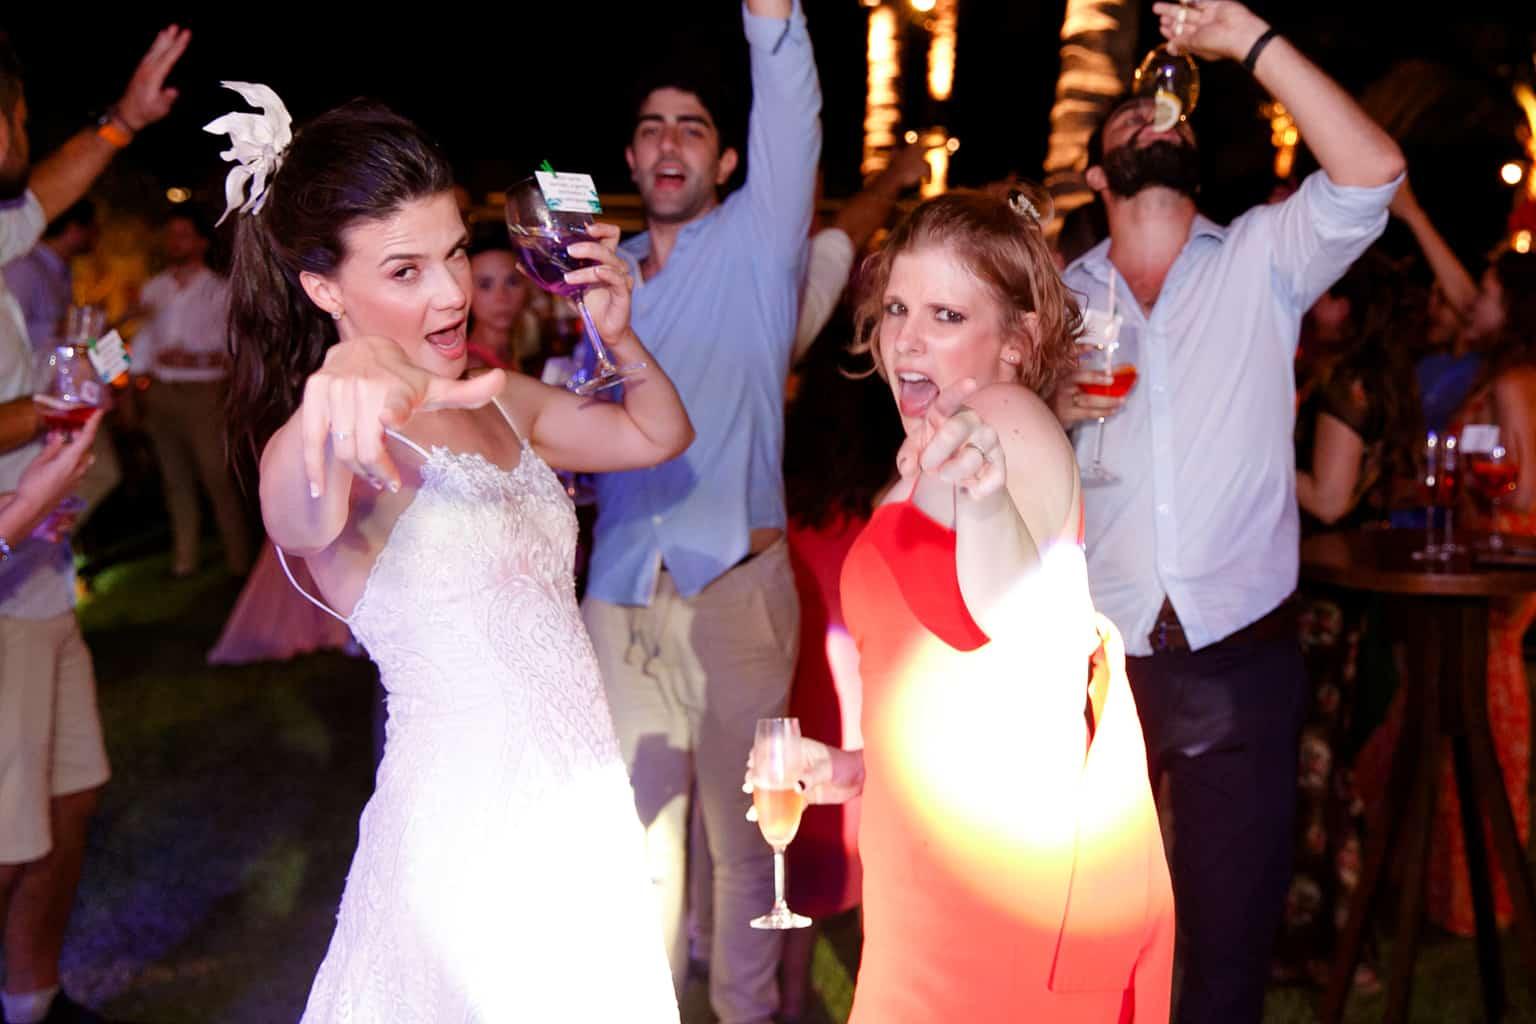 Casamento-Emanuelle-e-Alysson-Fotografia-Tadeu-Nanó-e-Luca-Antunes155